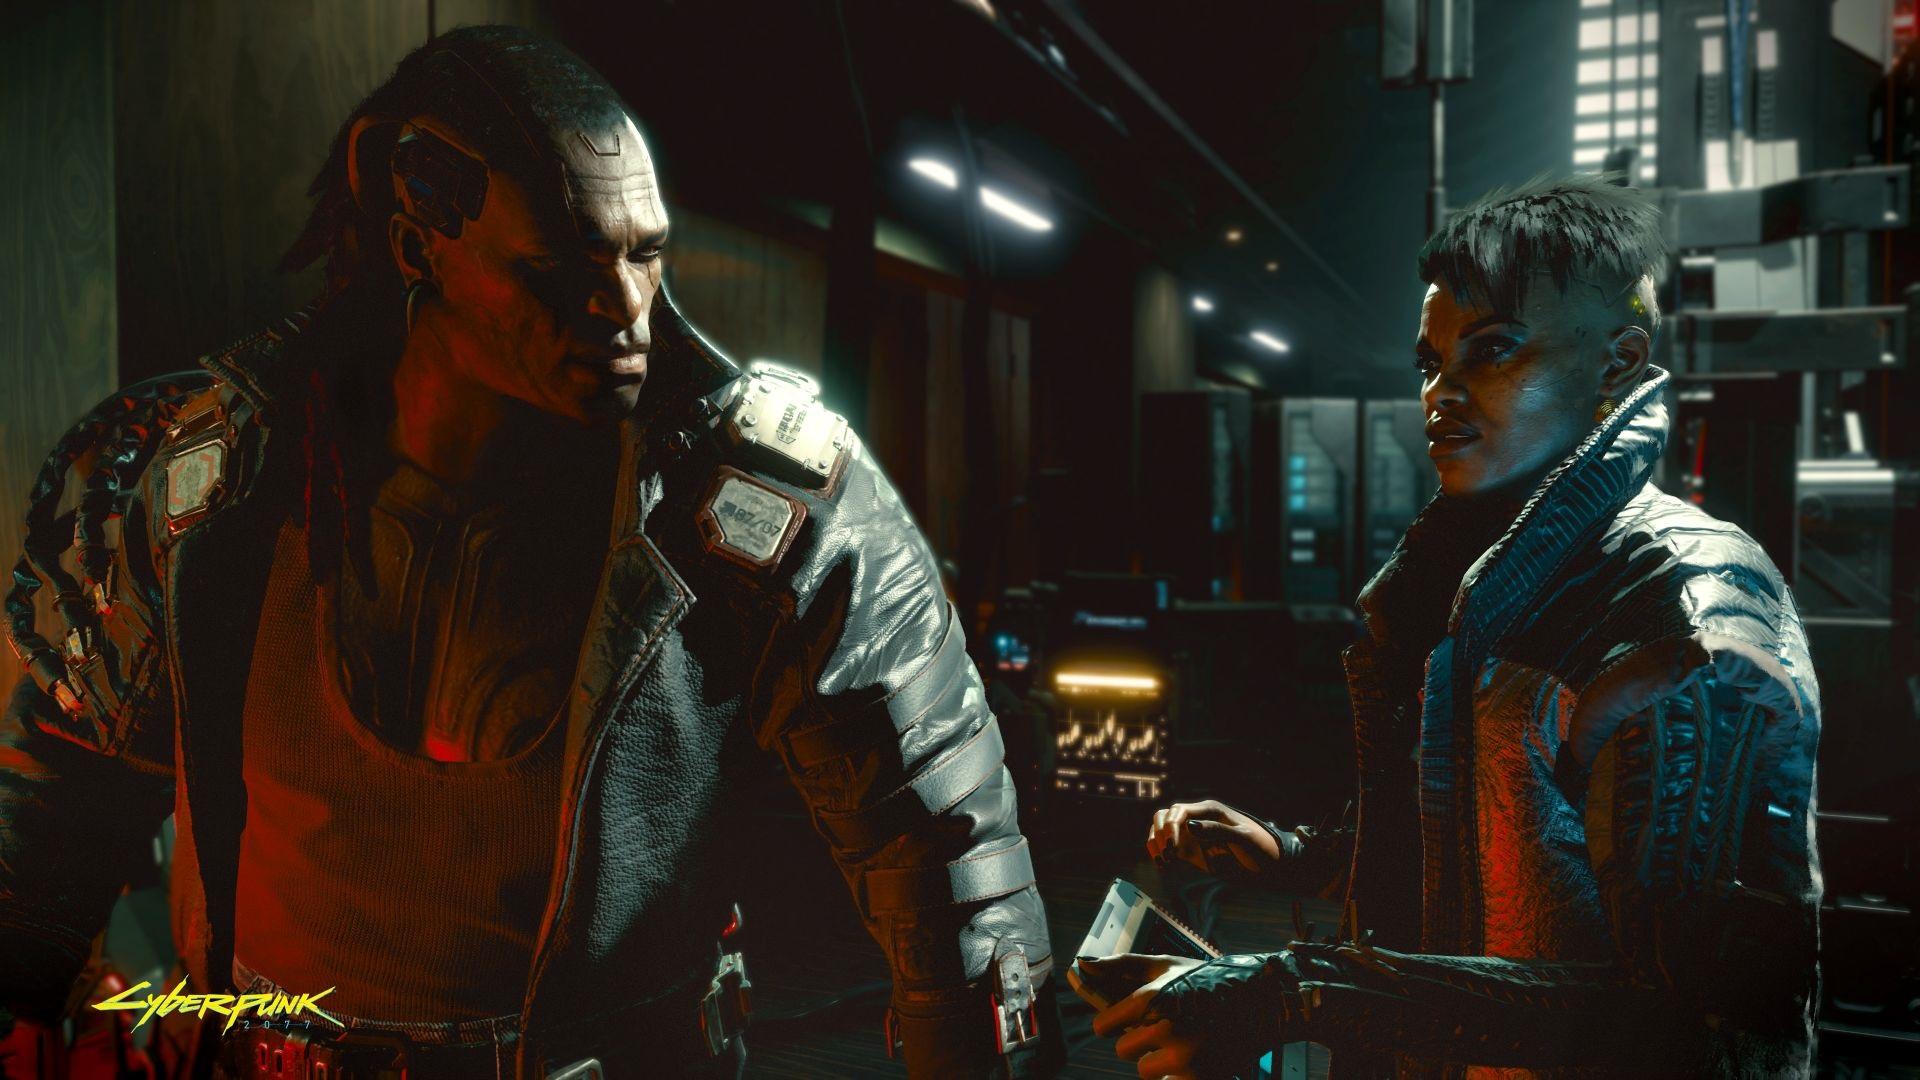 Cyberpunk 2077 release date delayed again: CD Projekt reveals new launch plans